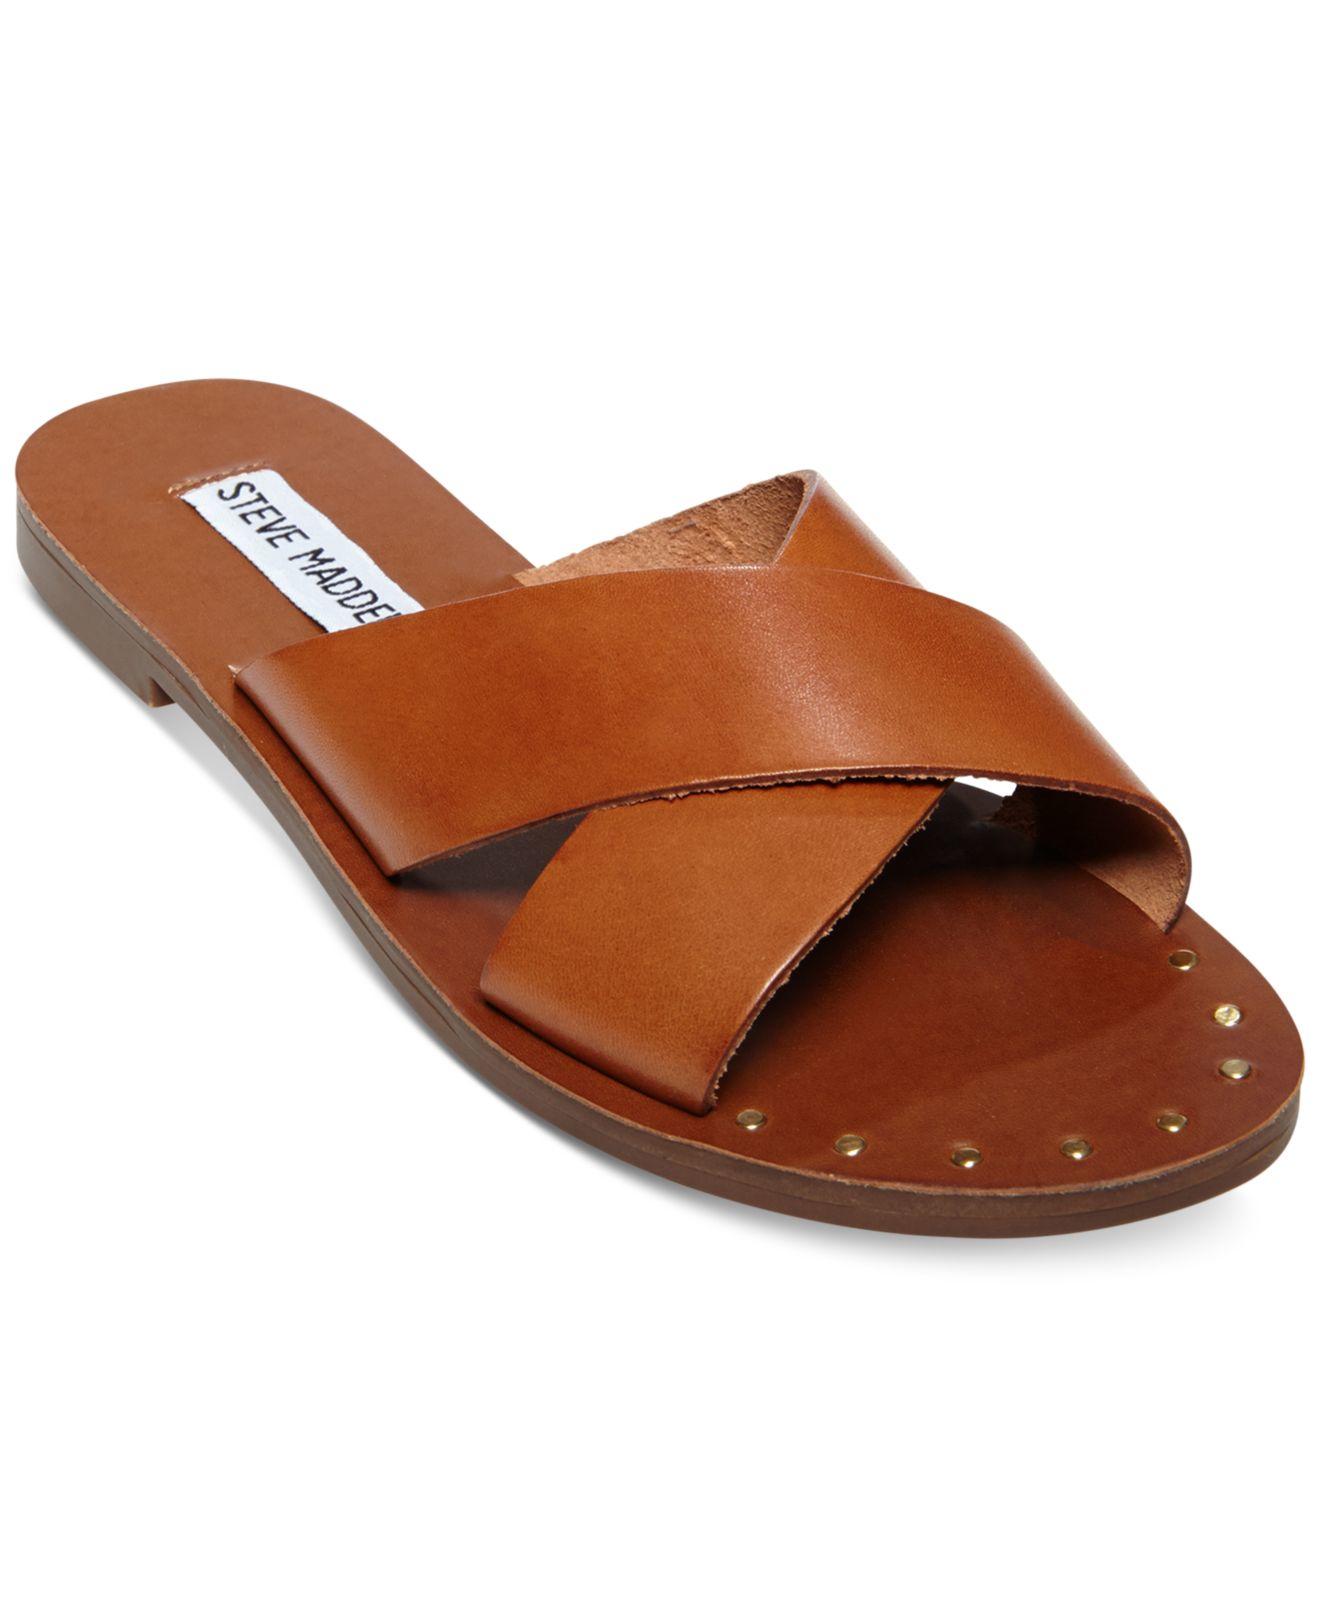 steve madden dryzzle crisscross sandals in brown lyst. Black Bedroom Furniture Sets. Home Design Ideas